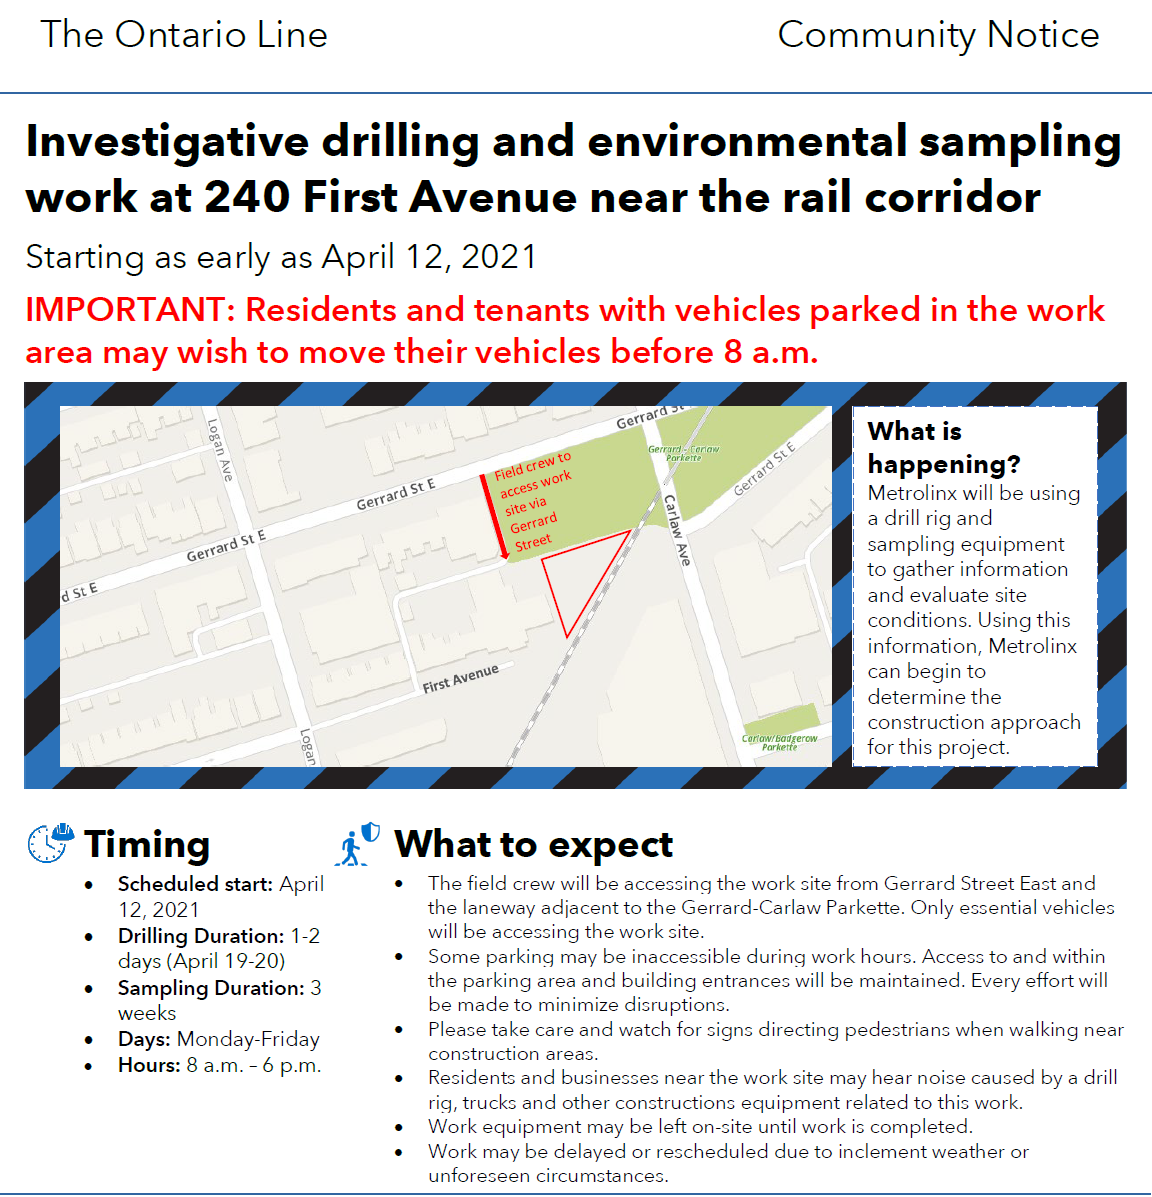 Metrolinx_work_-_240_First_Avenue.PNG